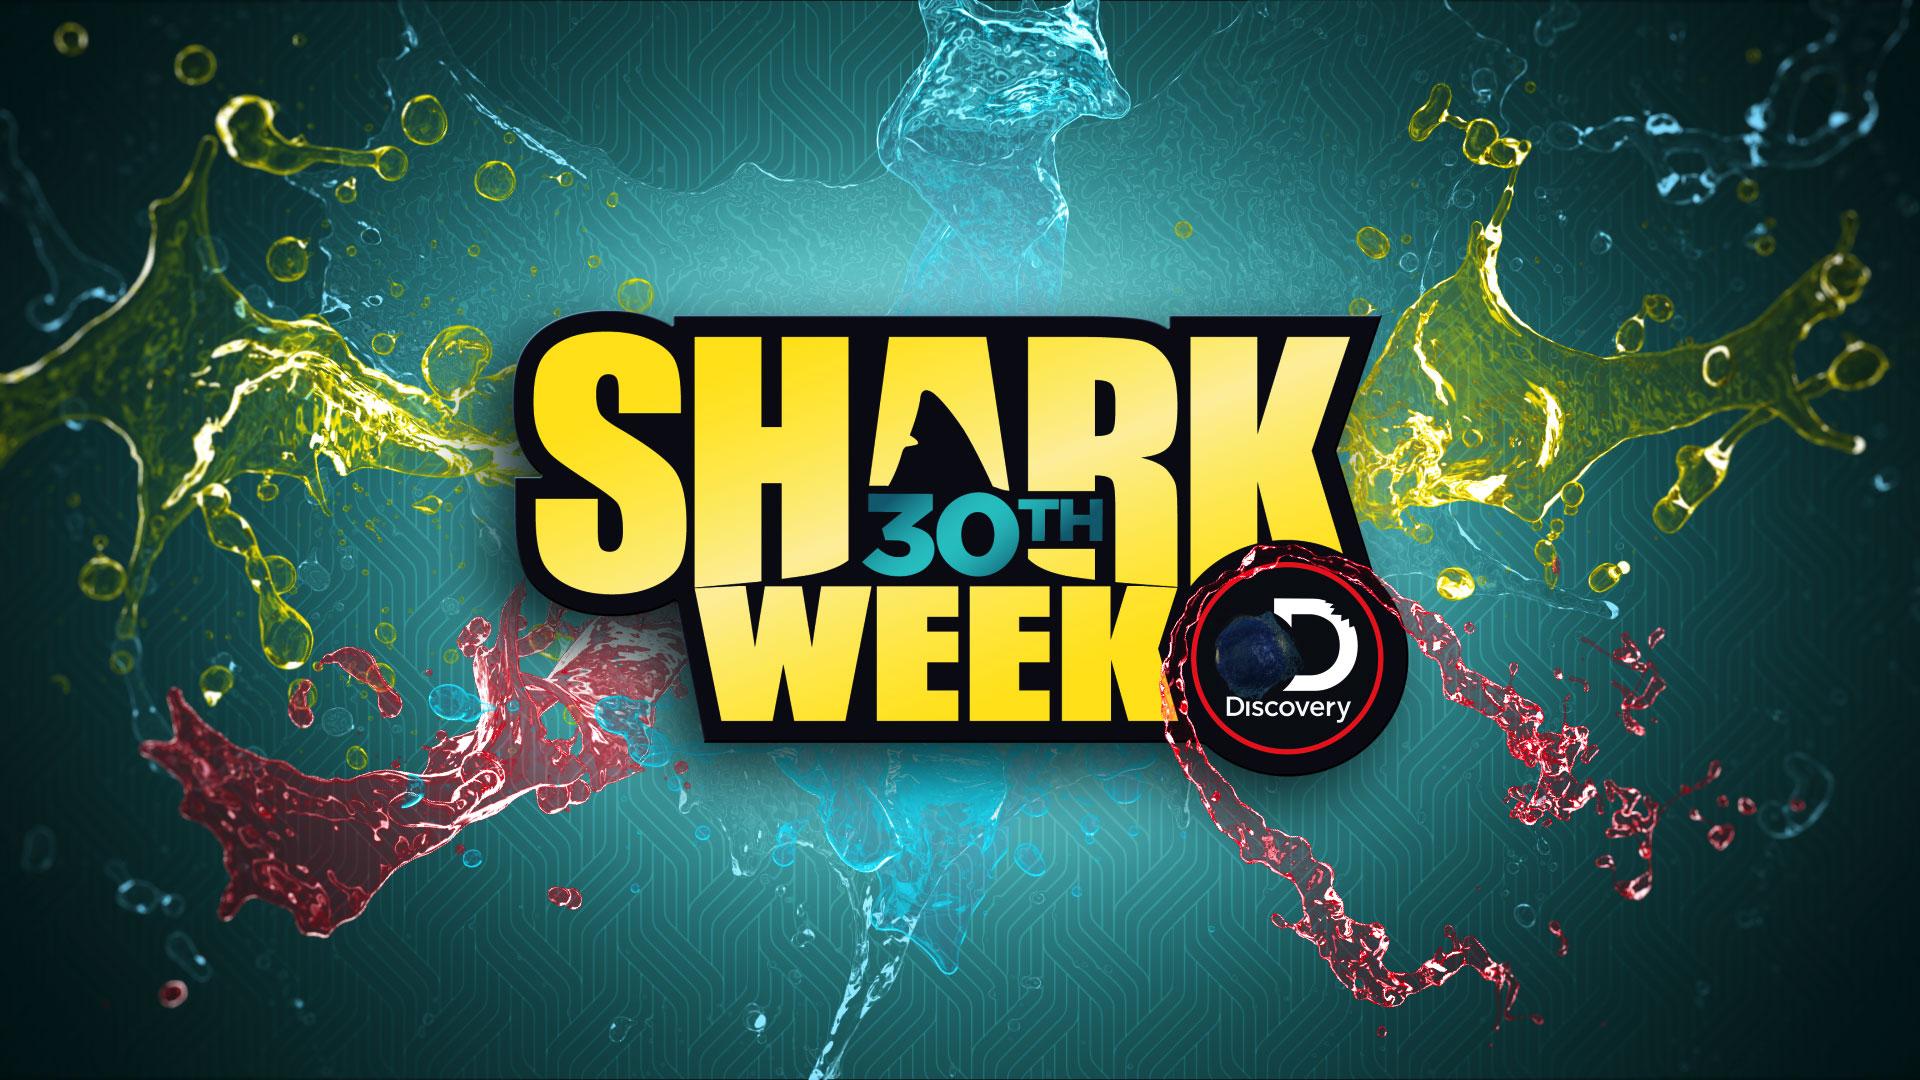 DISCOVERY    SHARK WEEK 30TH